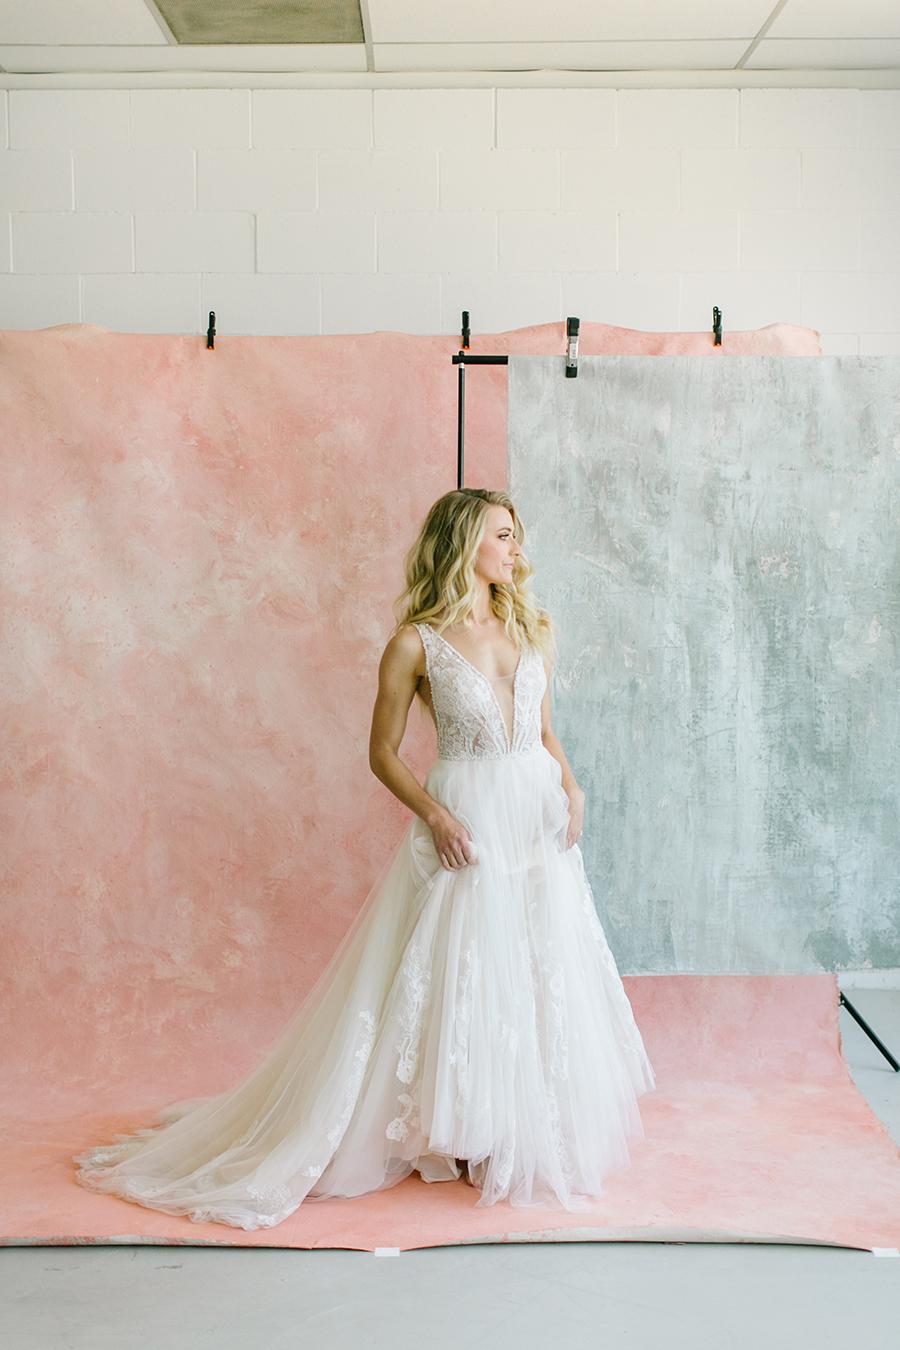 model standing in natural light studio on pink and grey custom painted backdrop in pleasanton ca.jpg